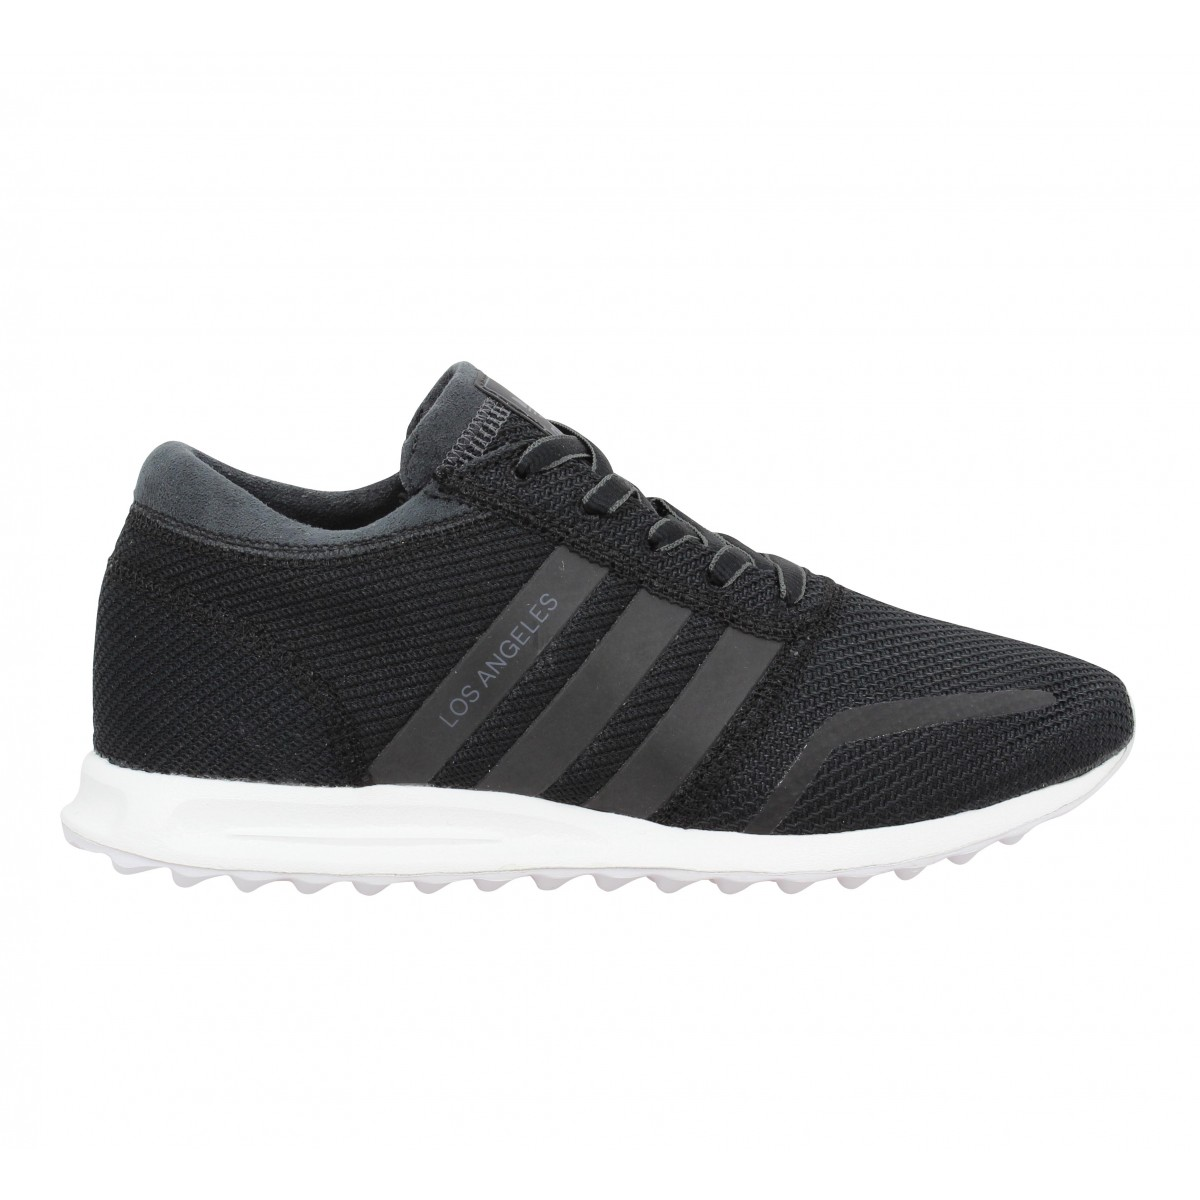 Adidas los angeles toile femme noir | Fanny chaussures